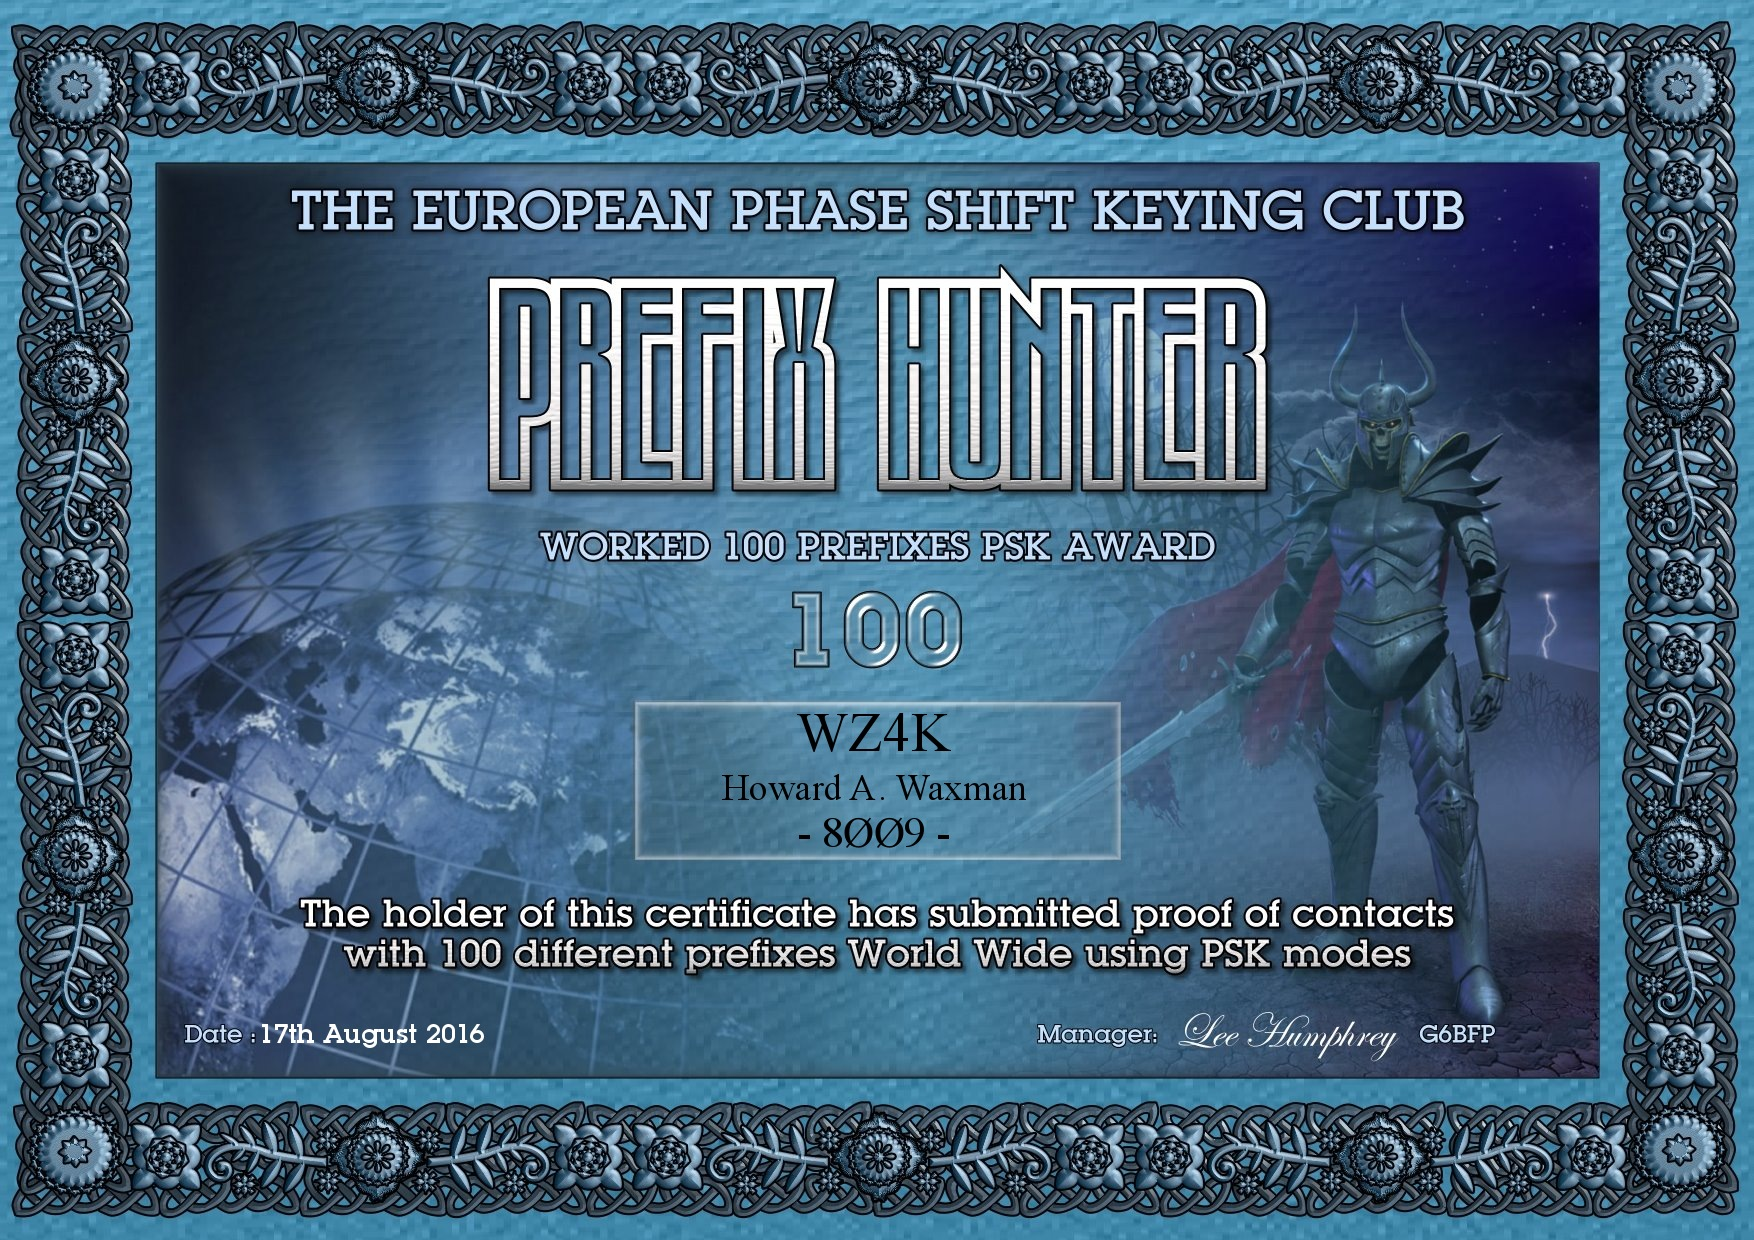 WZ4K-PHPA-100